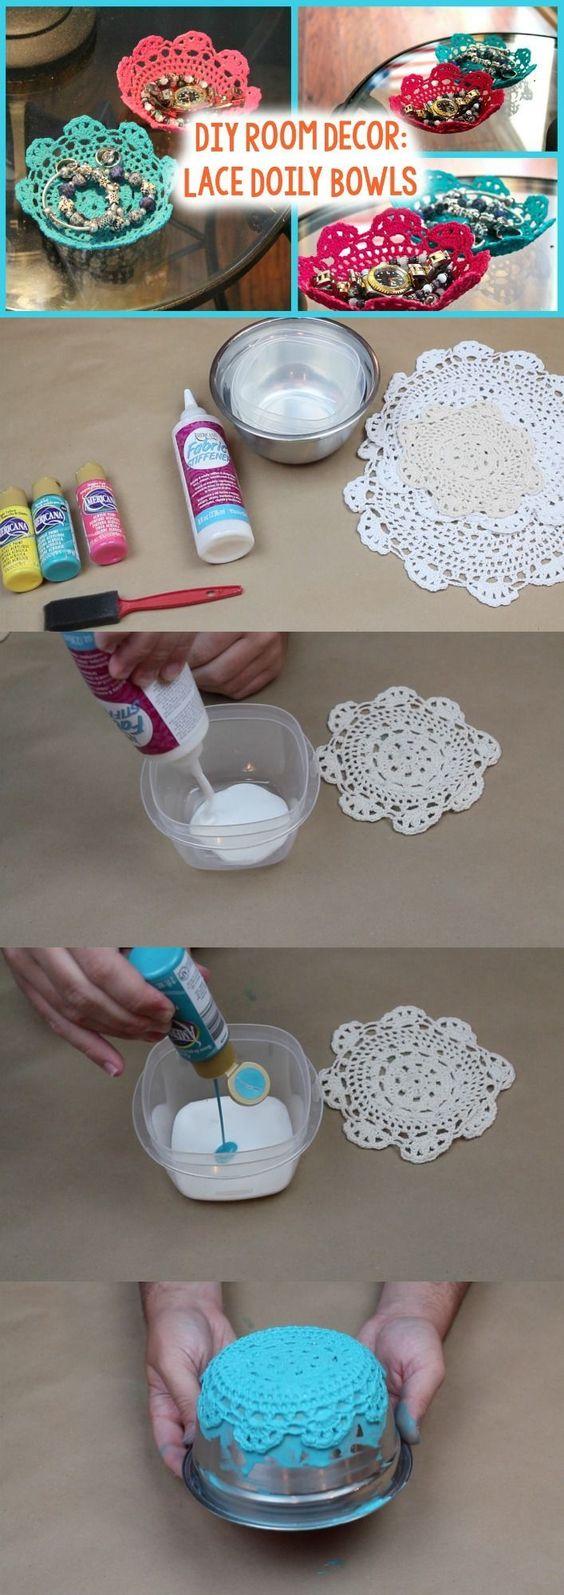 DIY Lace Doily Bowl.